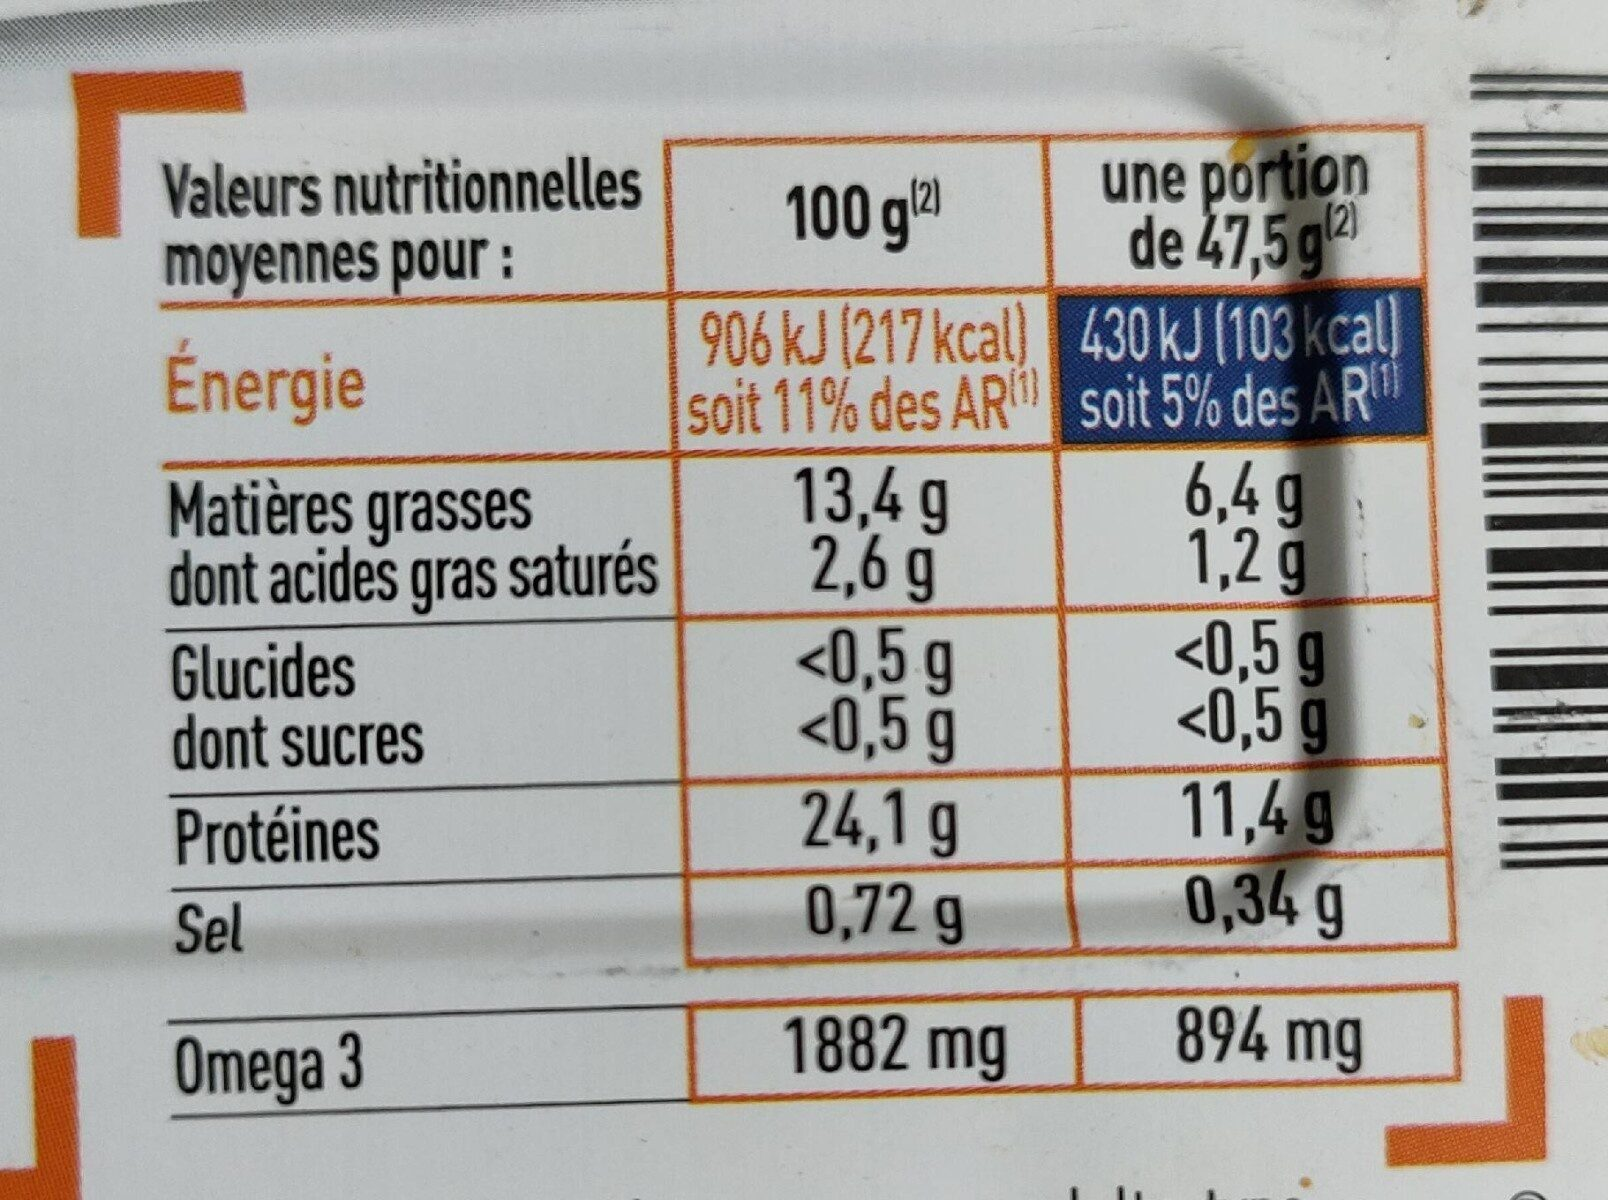 Netto Sardine Huile d Olive - Informations nutritionnelles - fr